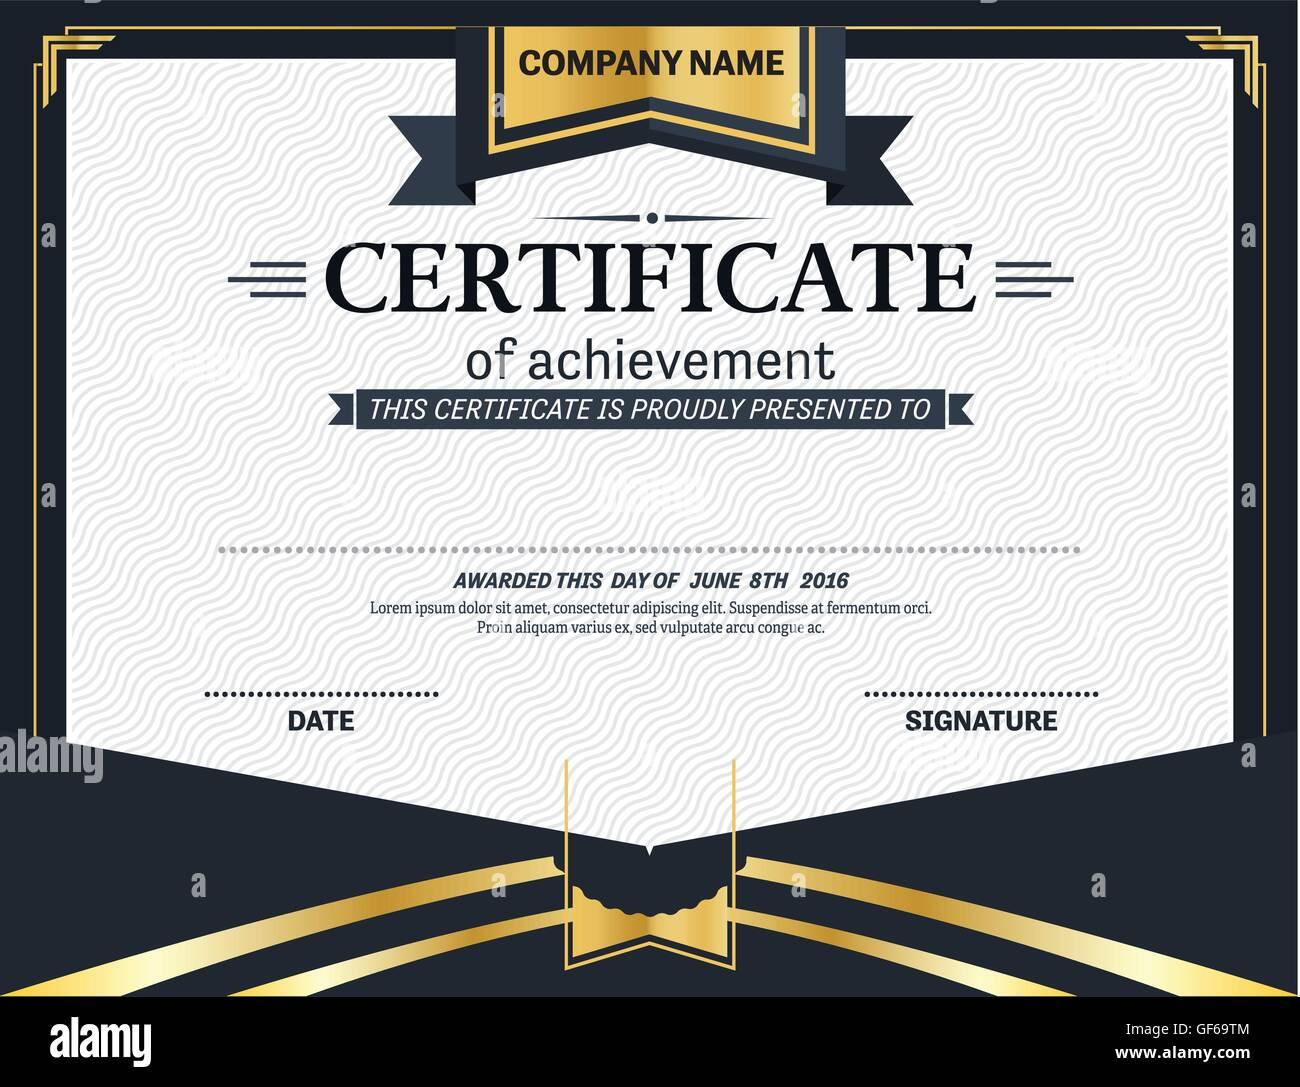 Certificate Border Stockfotos & Certificate Border Bilder - Seite 3 ...